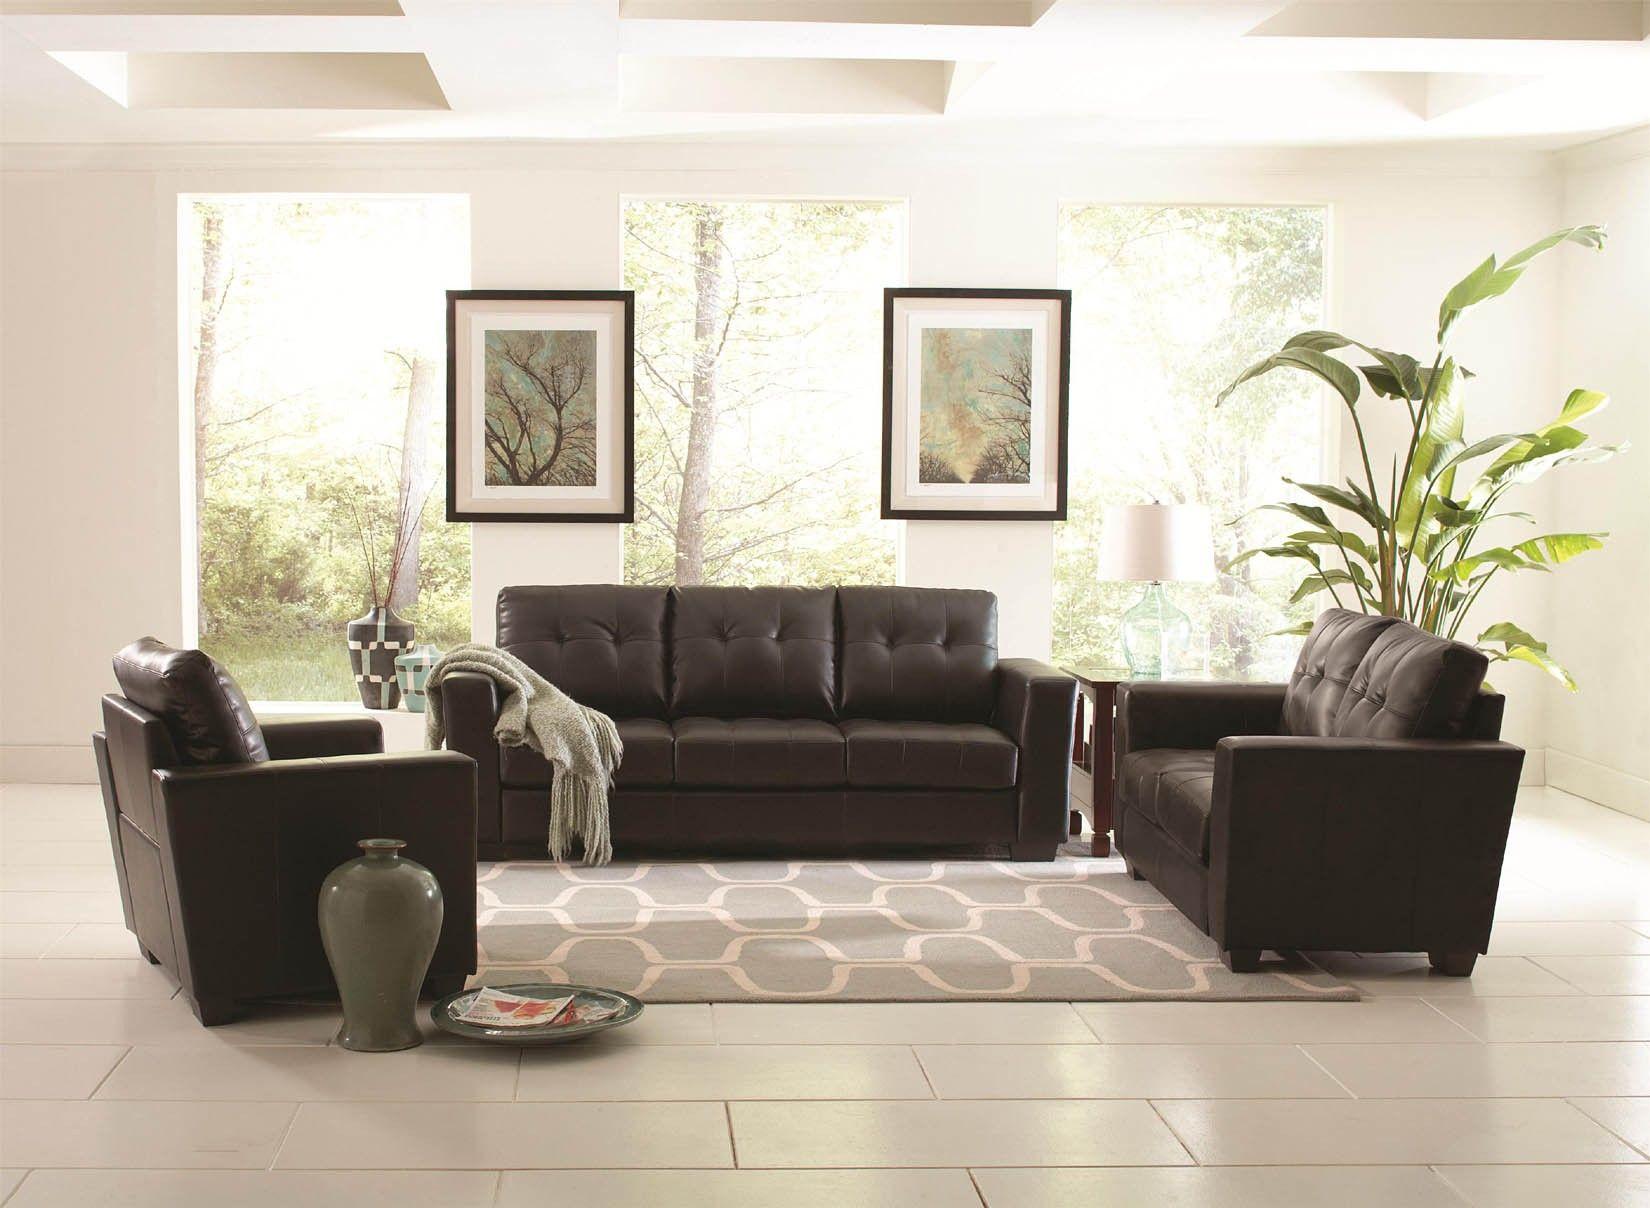 Decoration Small Living Room With Cream Wall Color Interior De